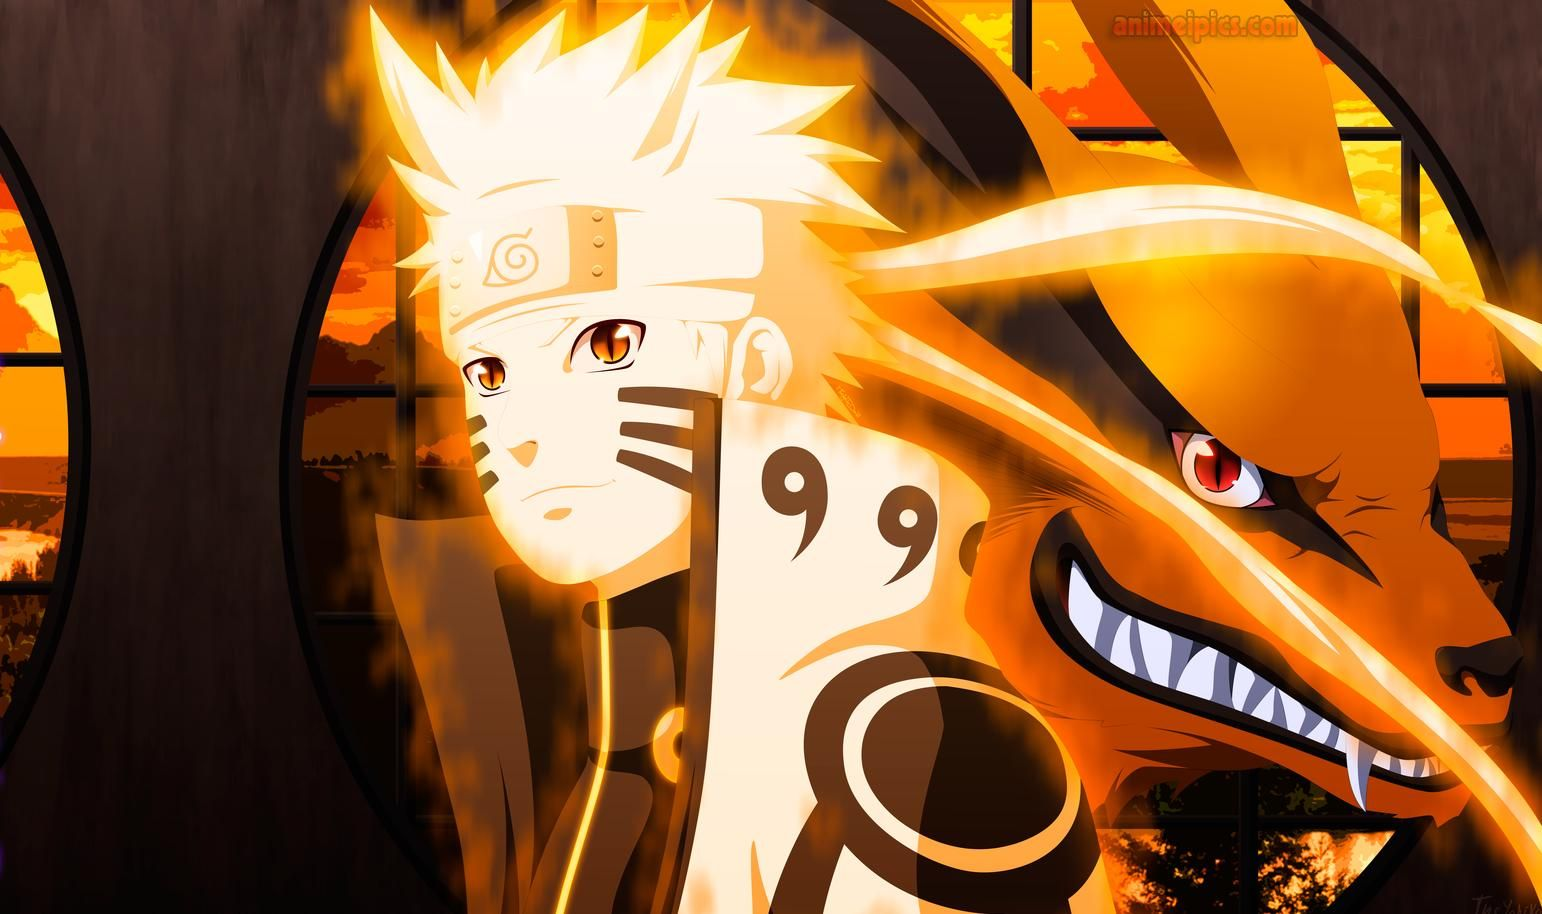 Naruto Uzumaki Nine Tails Chakra Mode Wallpaper Google Search Naruto Naruto Uzumaki Naruto Anime